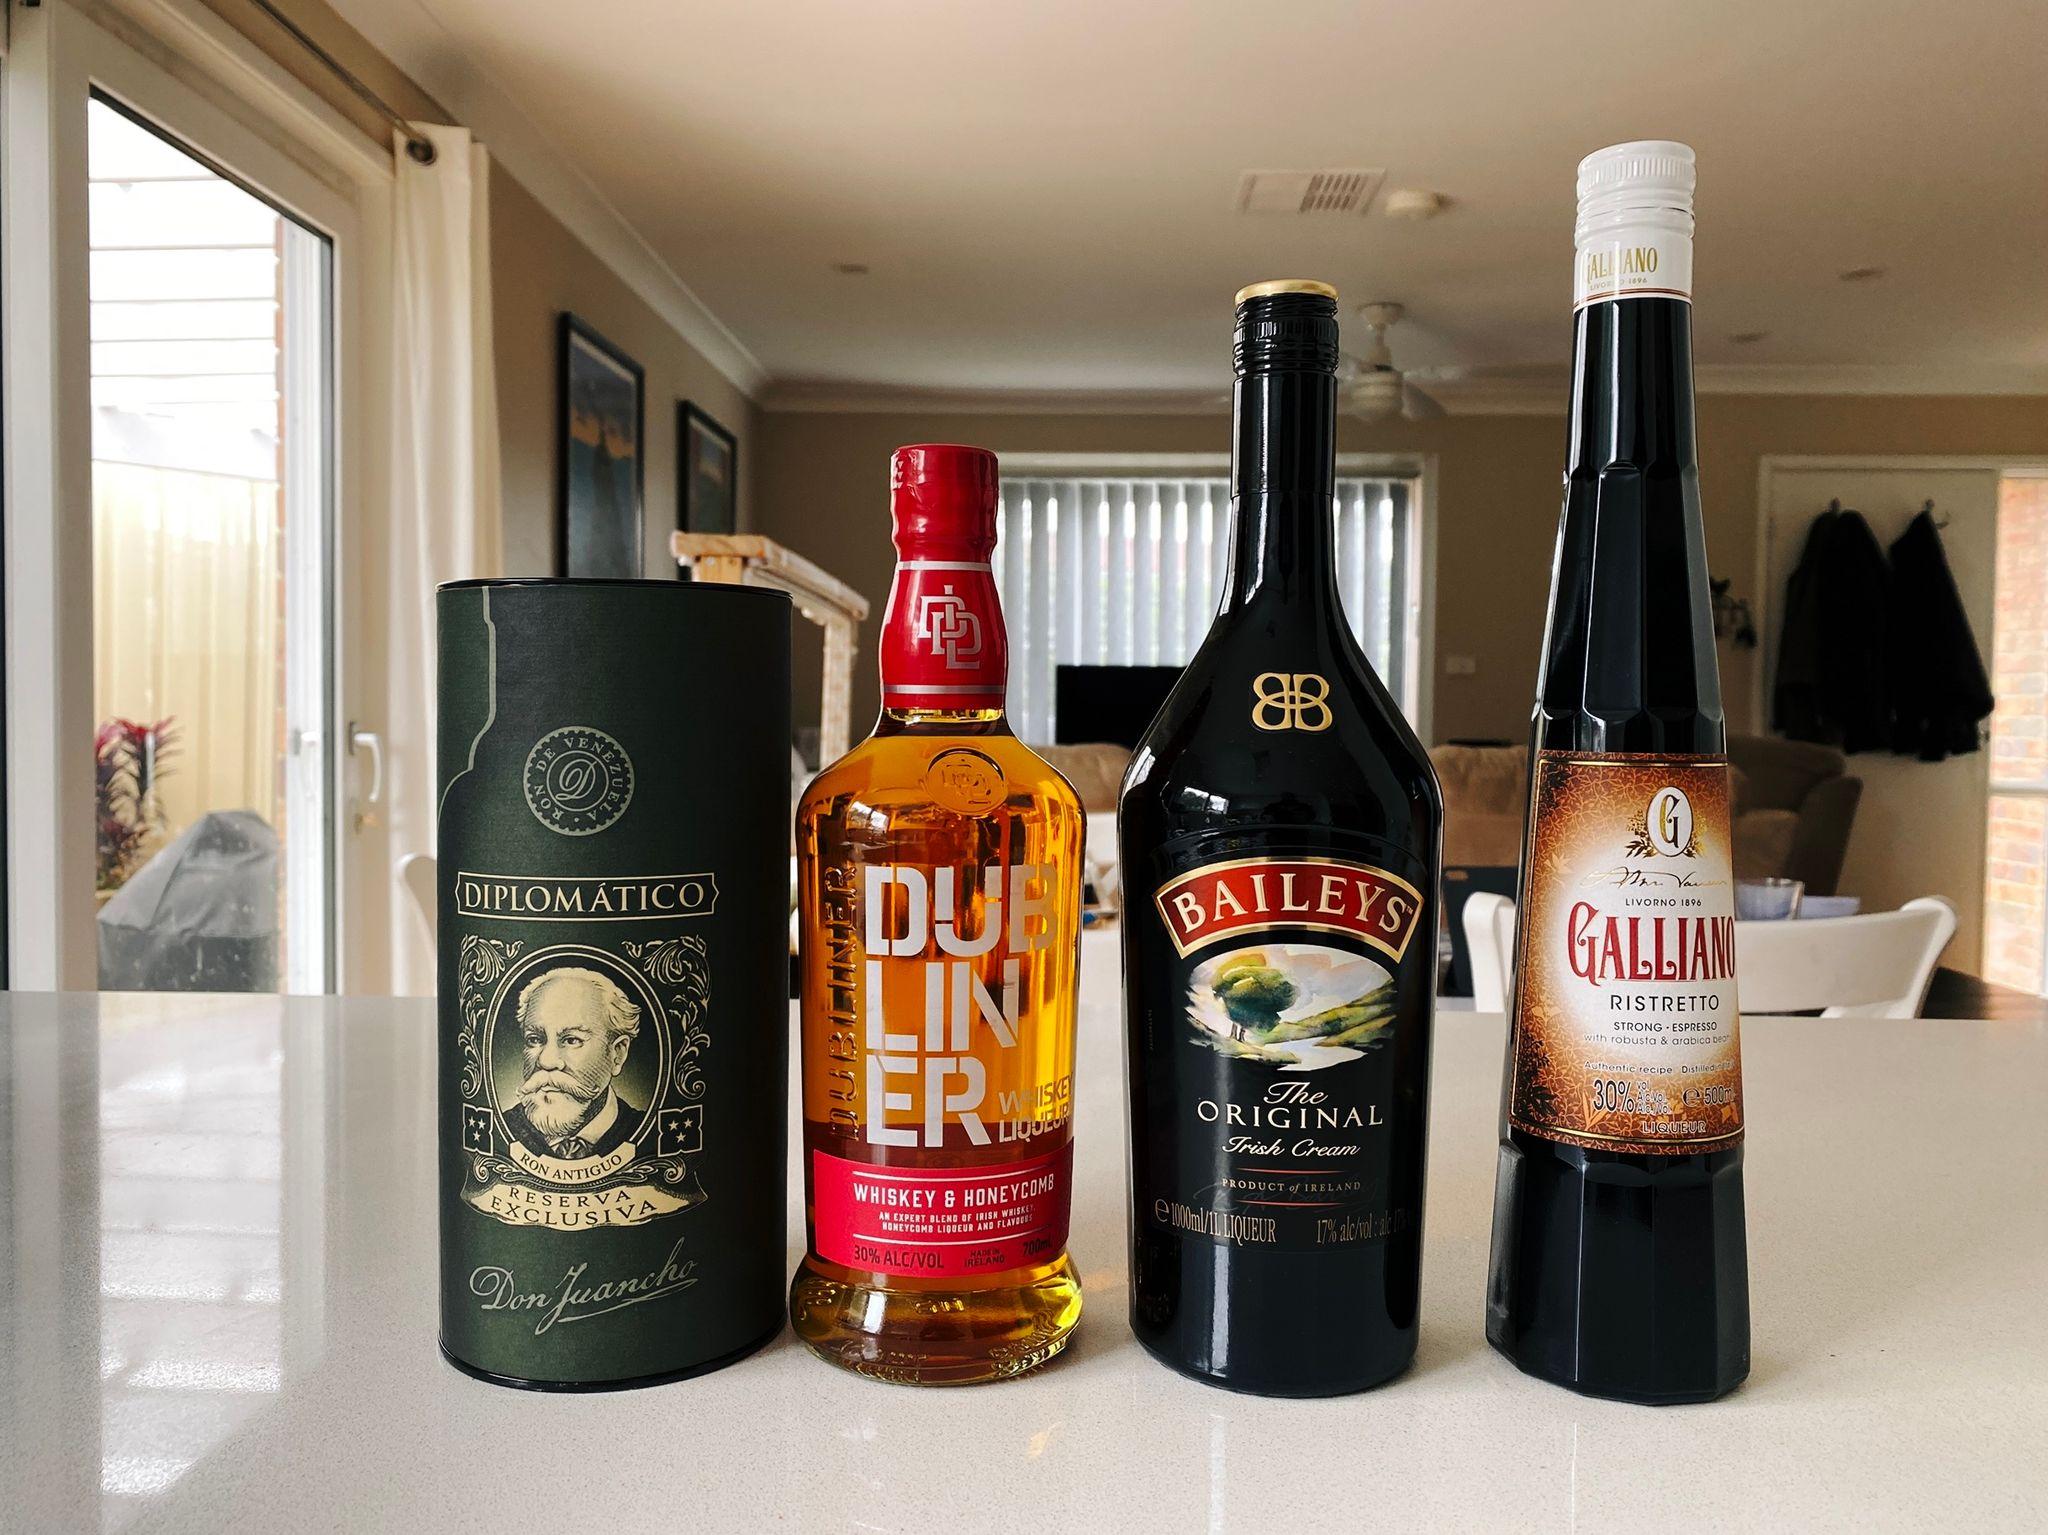 "A photo of four bottles of alcohol: ""Diplomatico""-brand dark rum, ""Dubliner"" whiskey/honeycomb liqueur, Baileys Irish Cream liqueur, and Galliano Ristretto coffee liqueur."